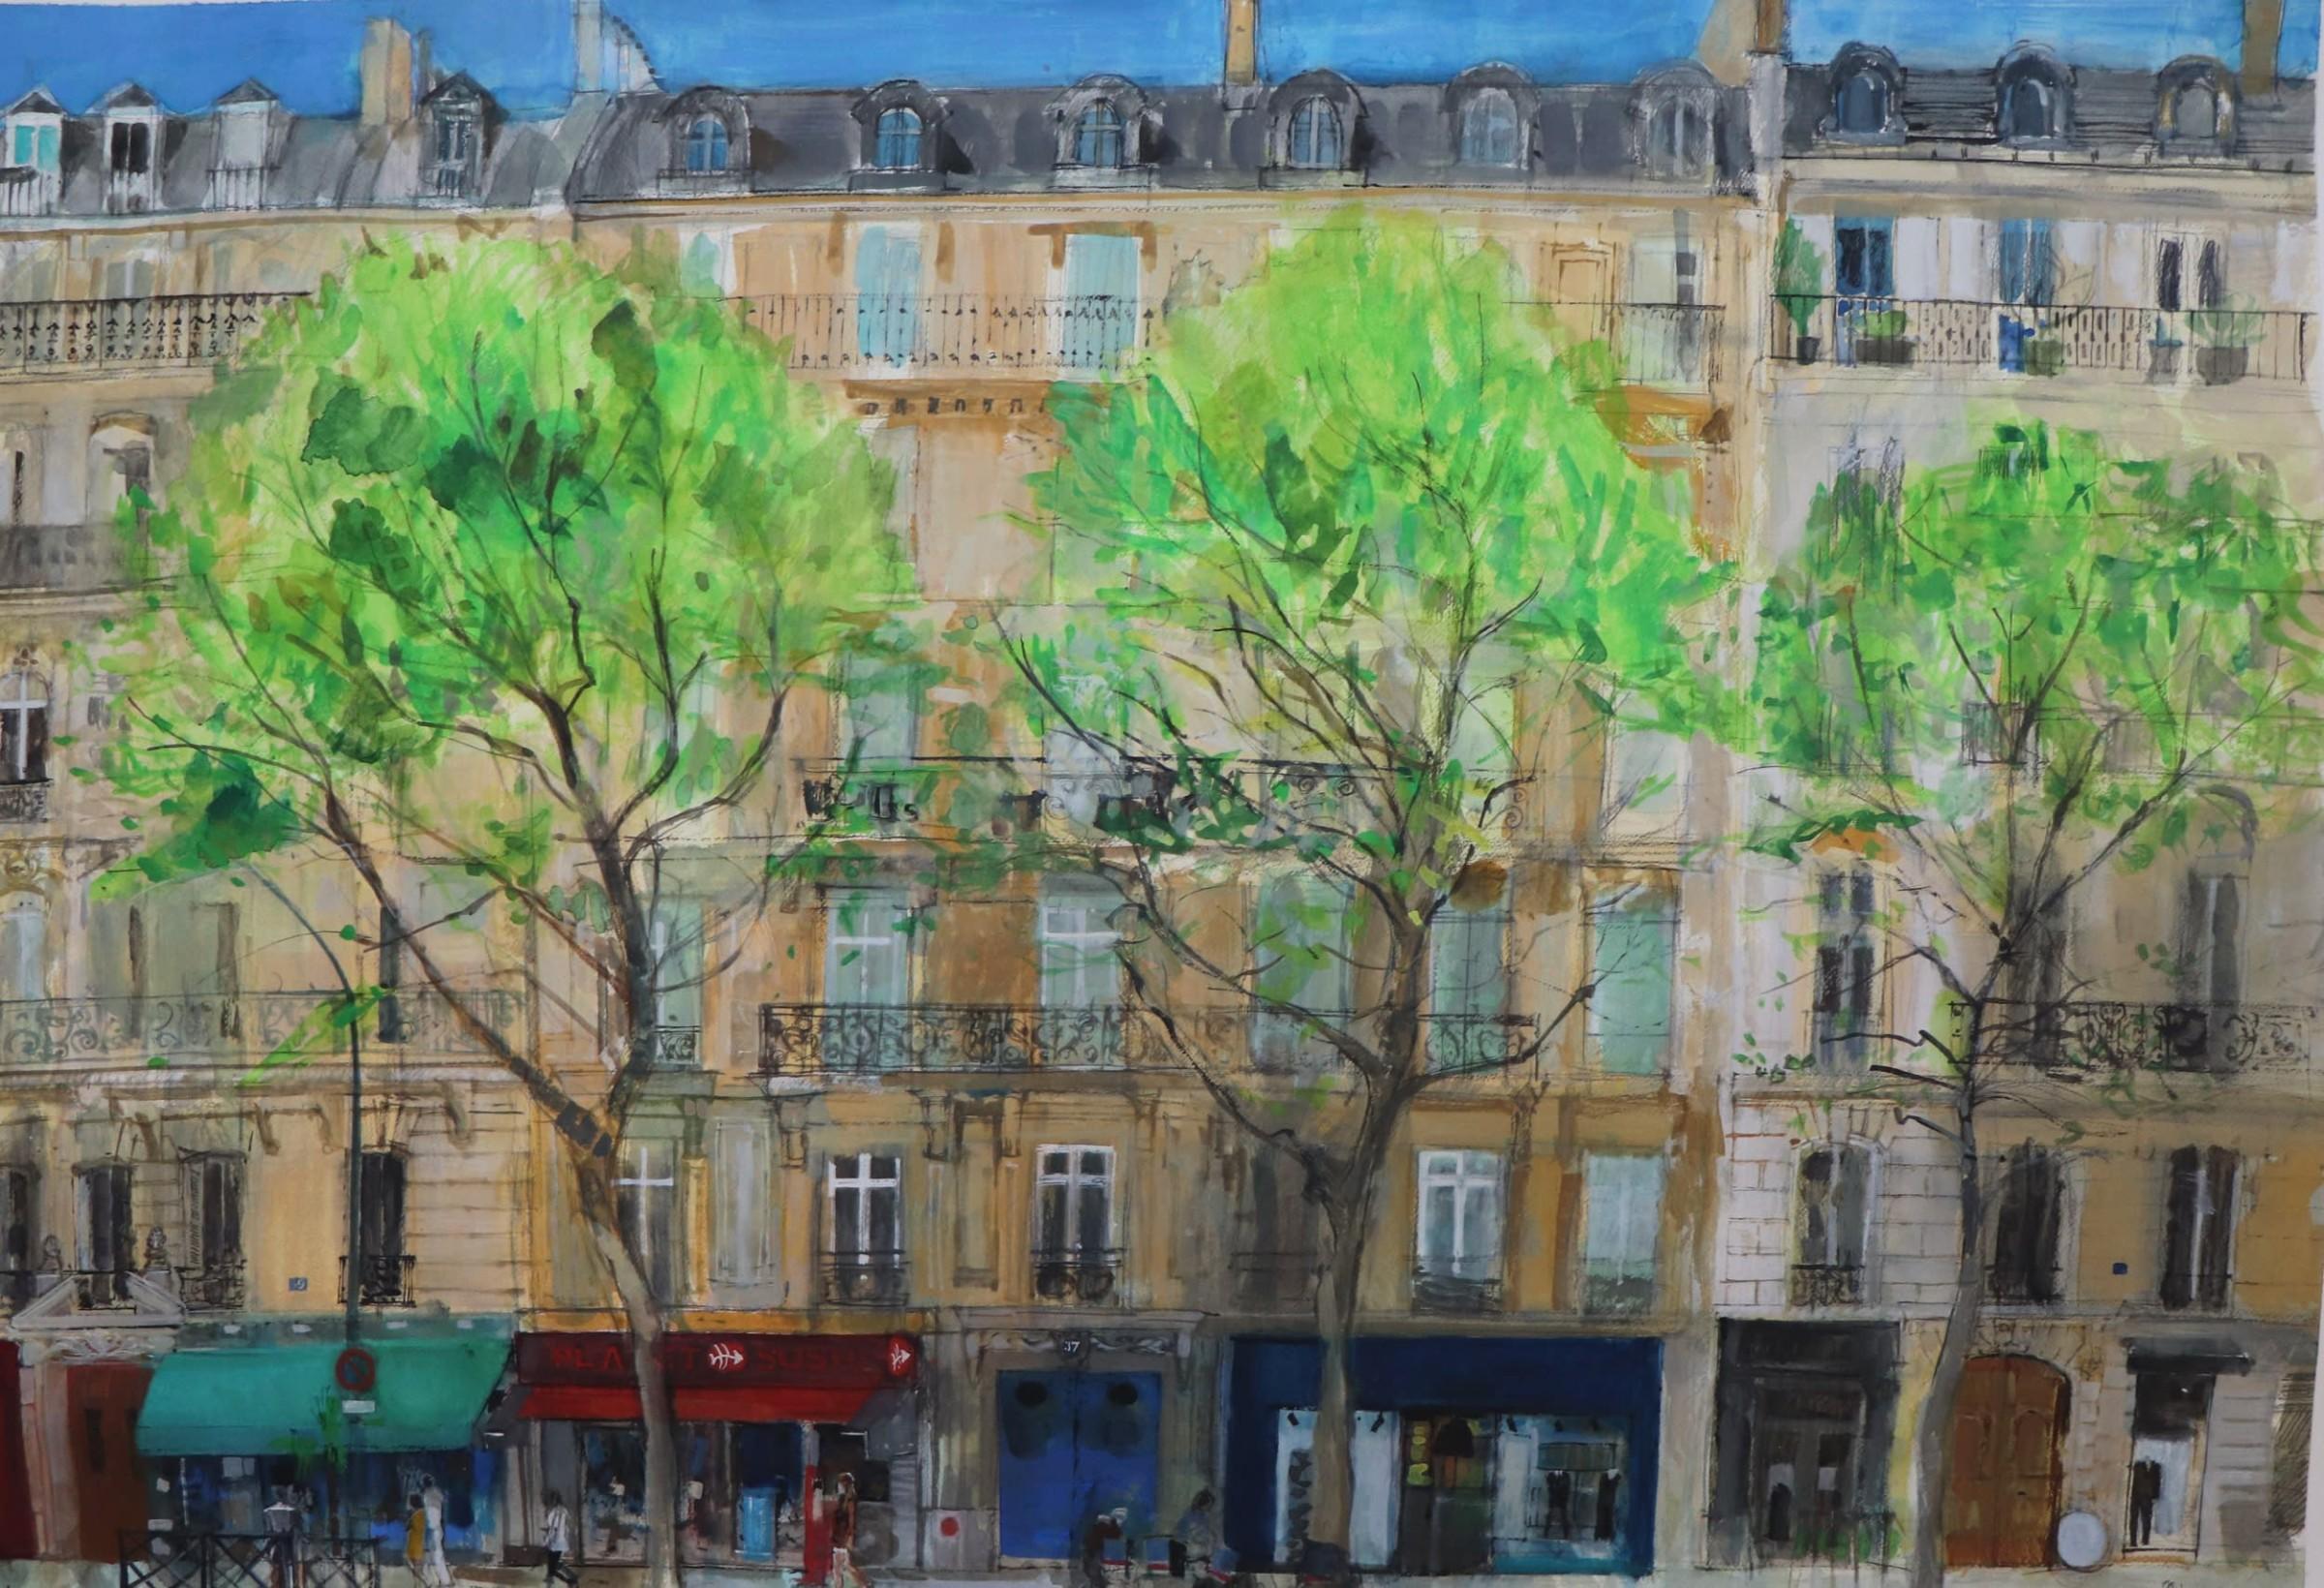 "<span class=""link fancybox-details-link""><a href=""/artists/96-peter-quinn/works/12657-peter-quinn-boulevard-paris/"">View Detail Page</a></span><div class=""artist""><span class=""artist""><strong>Peter Quinn</strong></span></div><div class=""title""><em>Boulevard, Paris</em></div><div class=""medium"">watercolour on paper</div><div class=""dimensions"">Artwork: 115 x 80cm</div><div class=""price"">£1,750.00</div>"